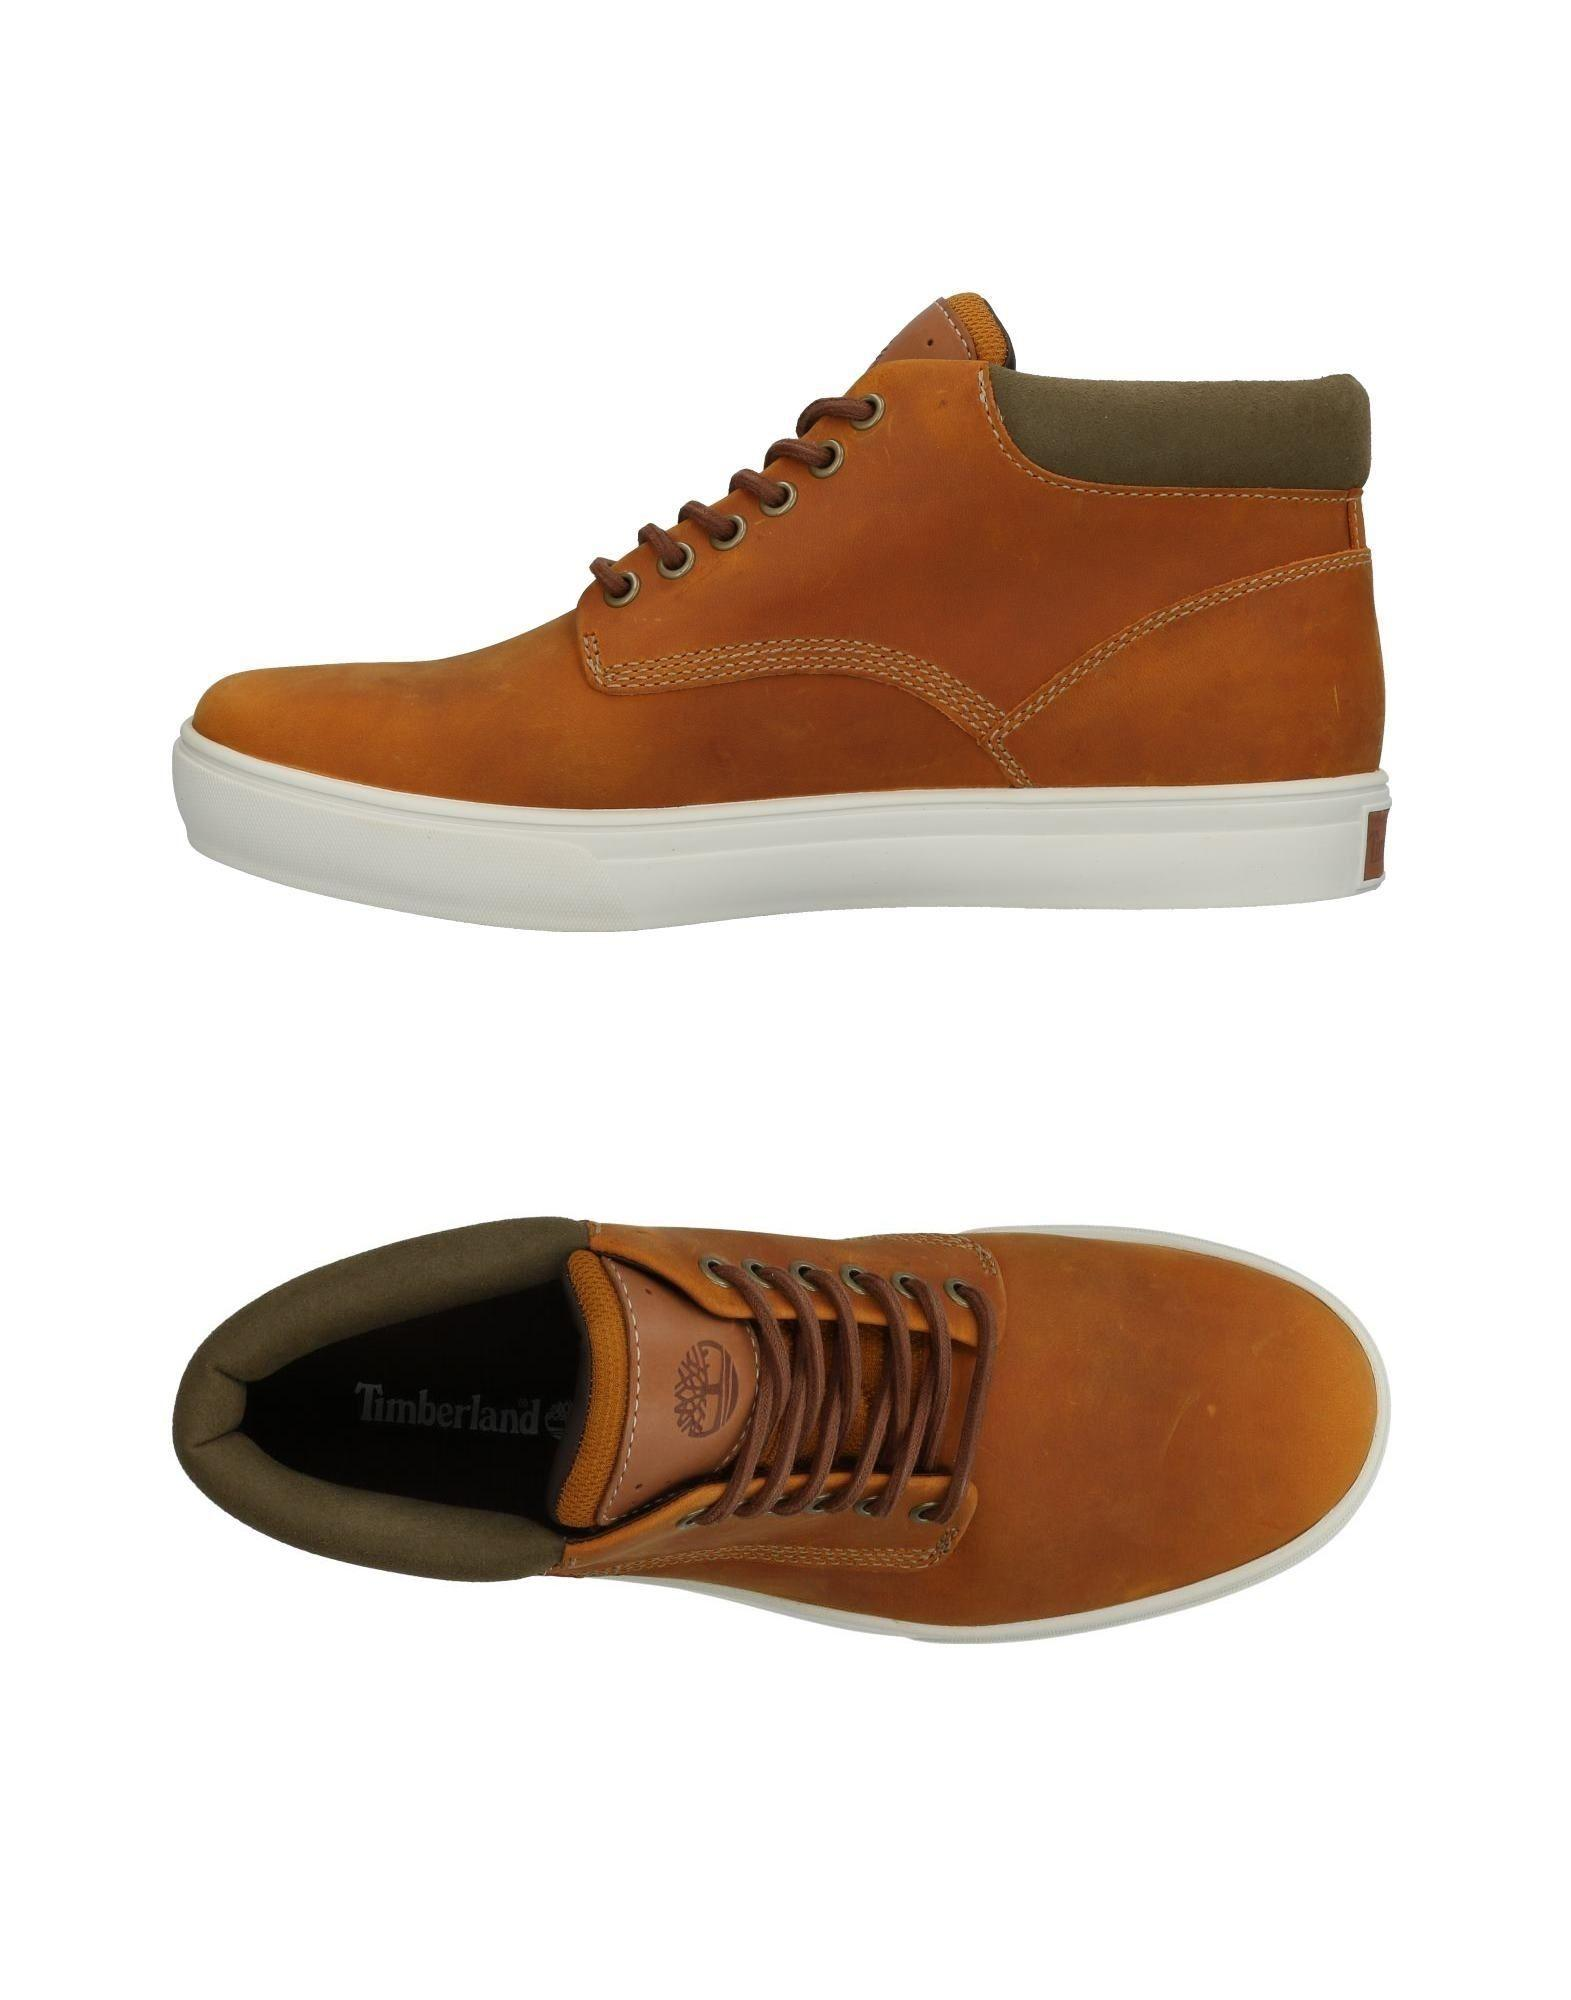 Timberland Sneakers In Ocher